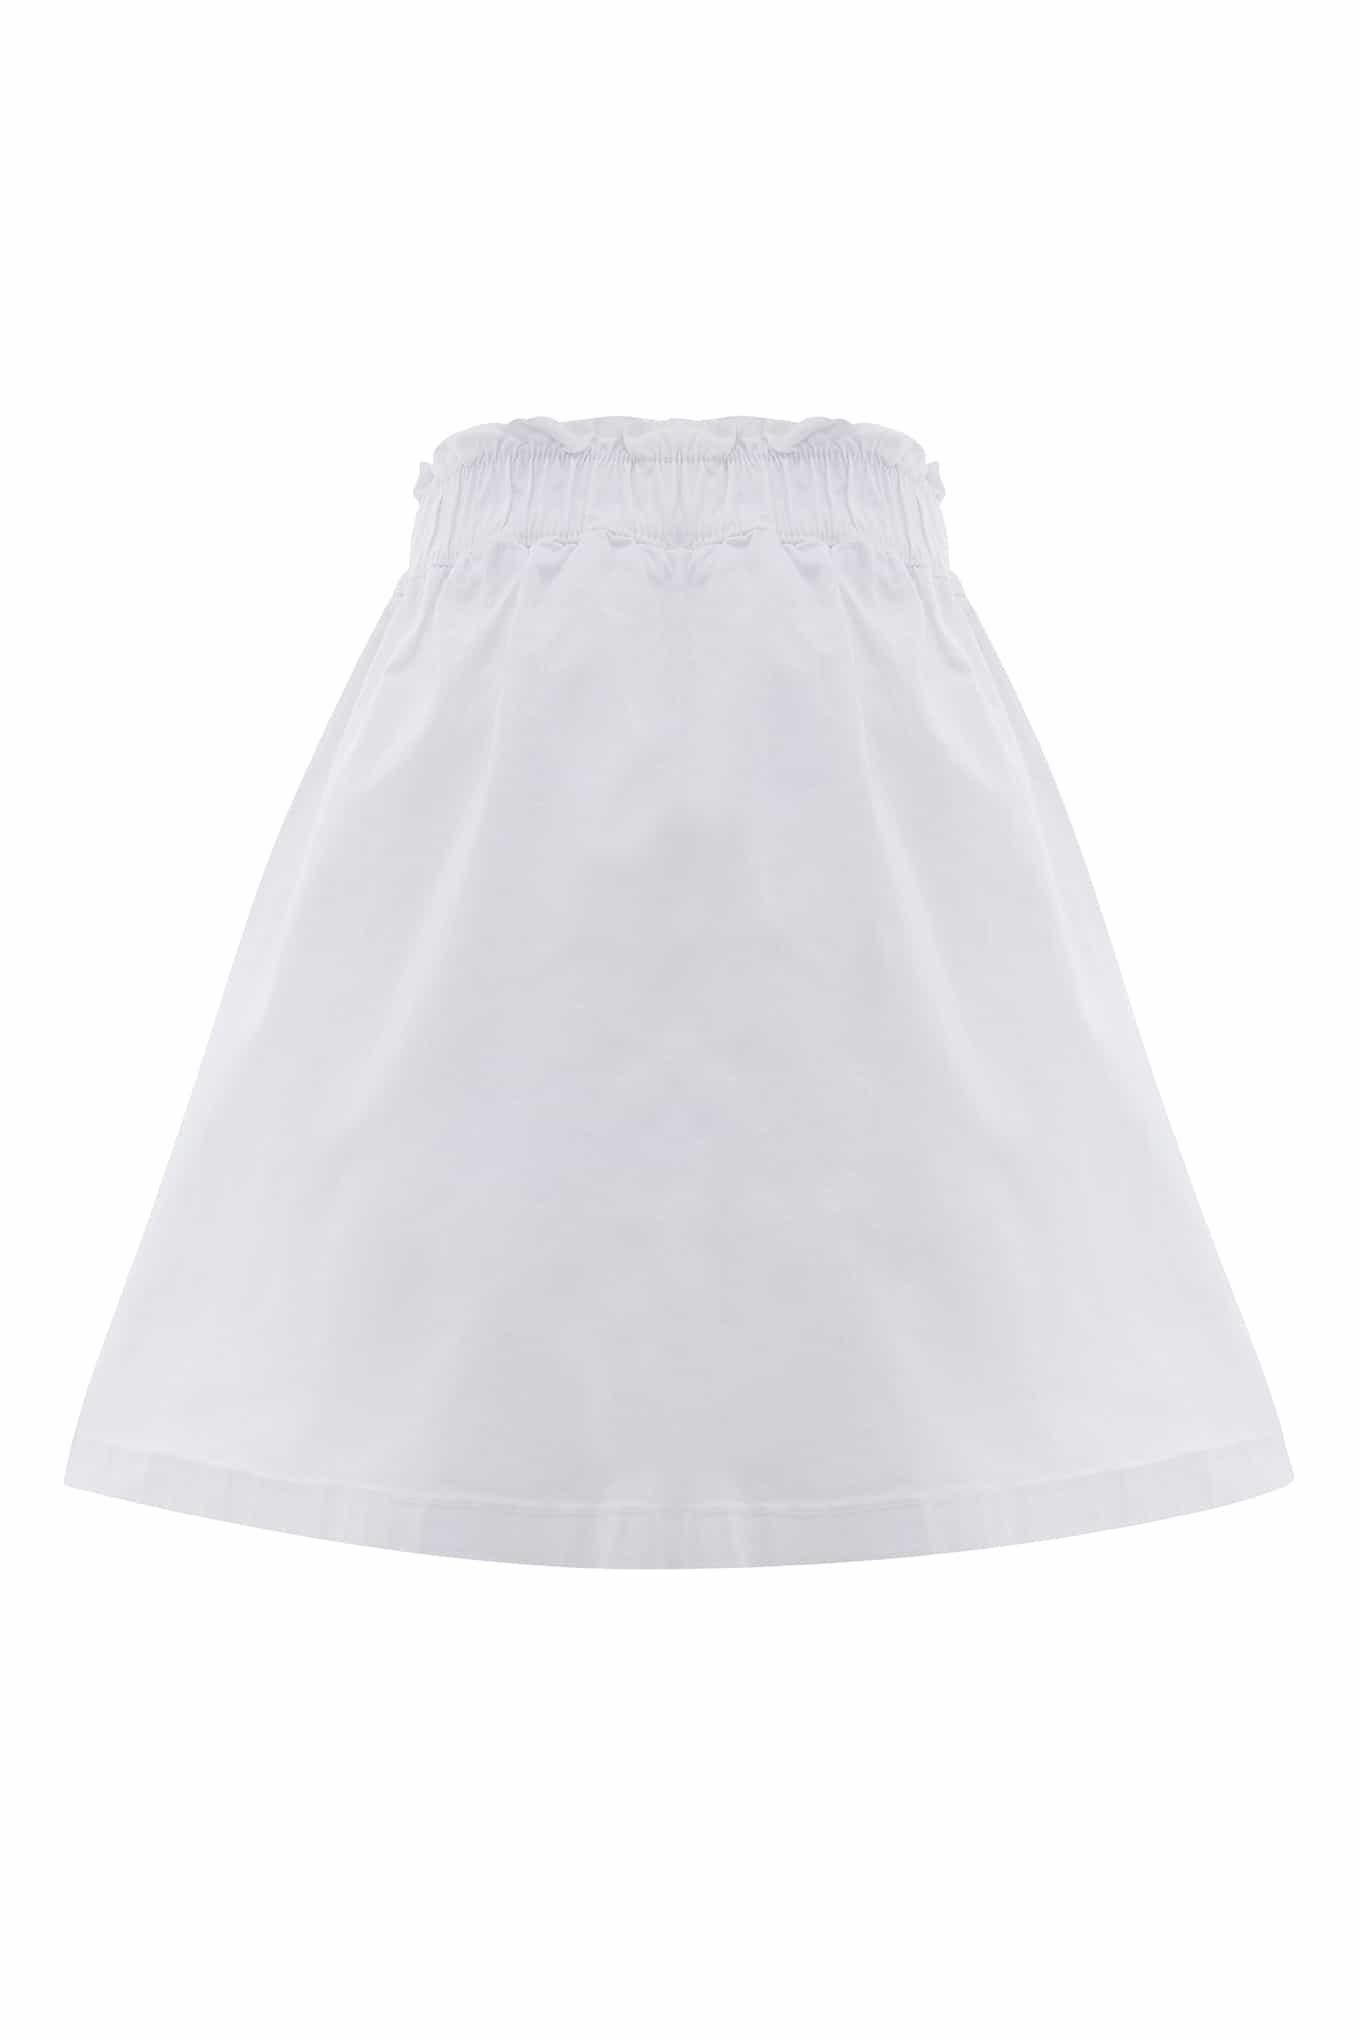 Saia Branco Casual Rapariga